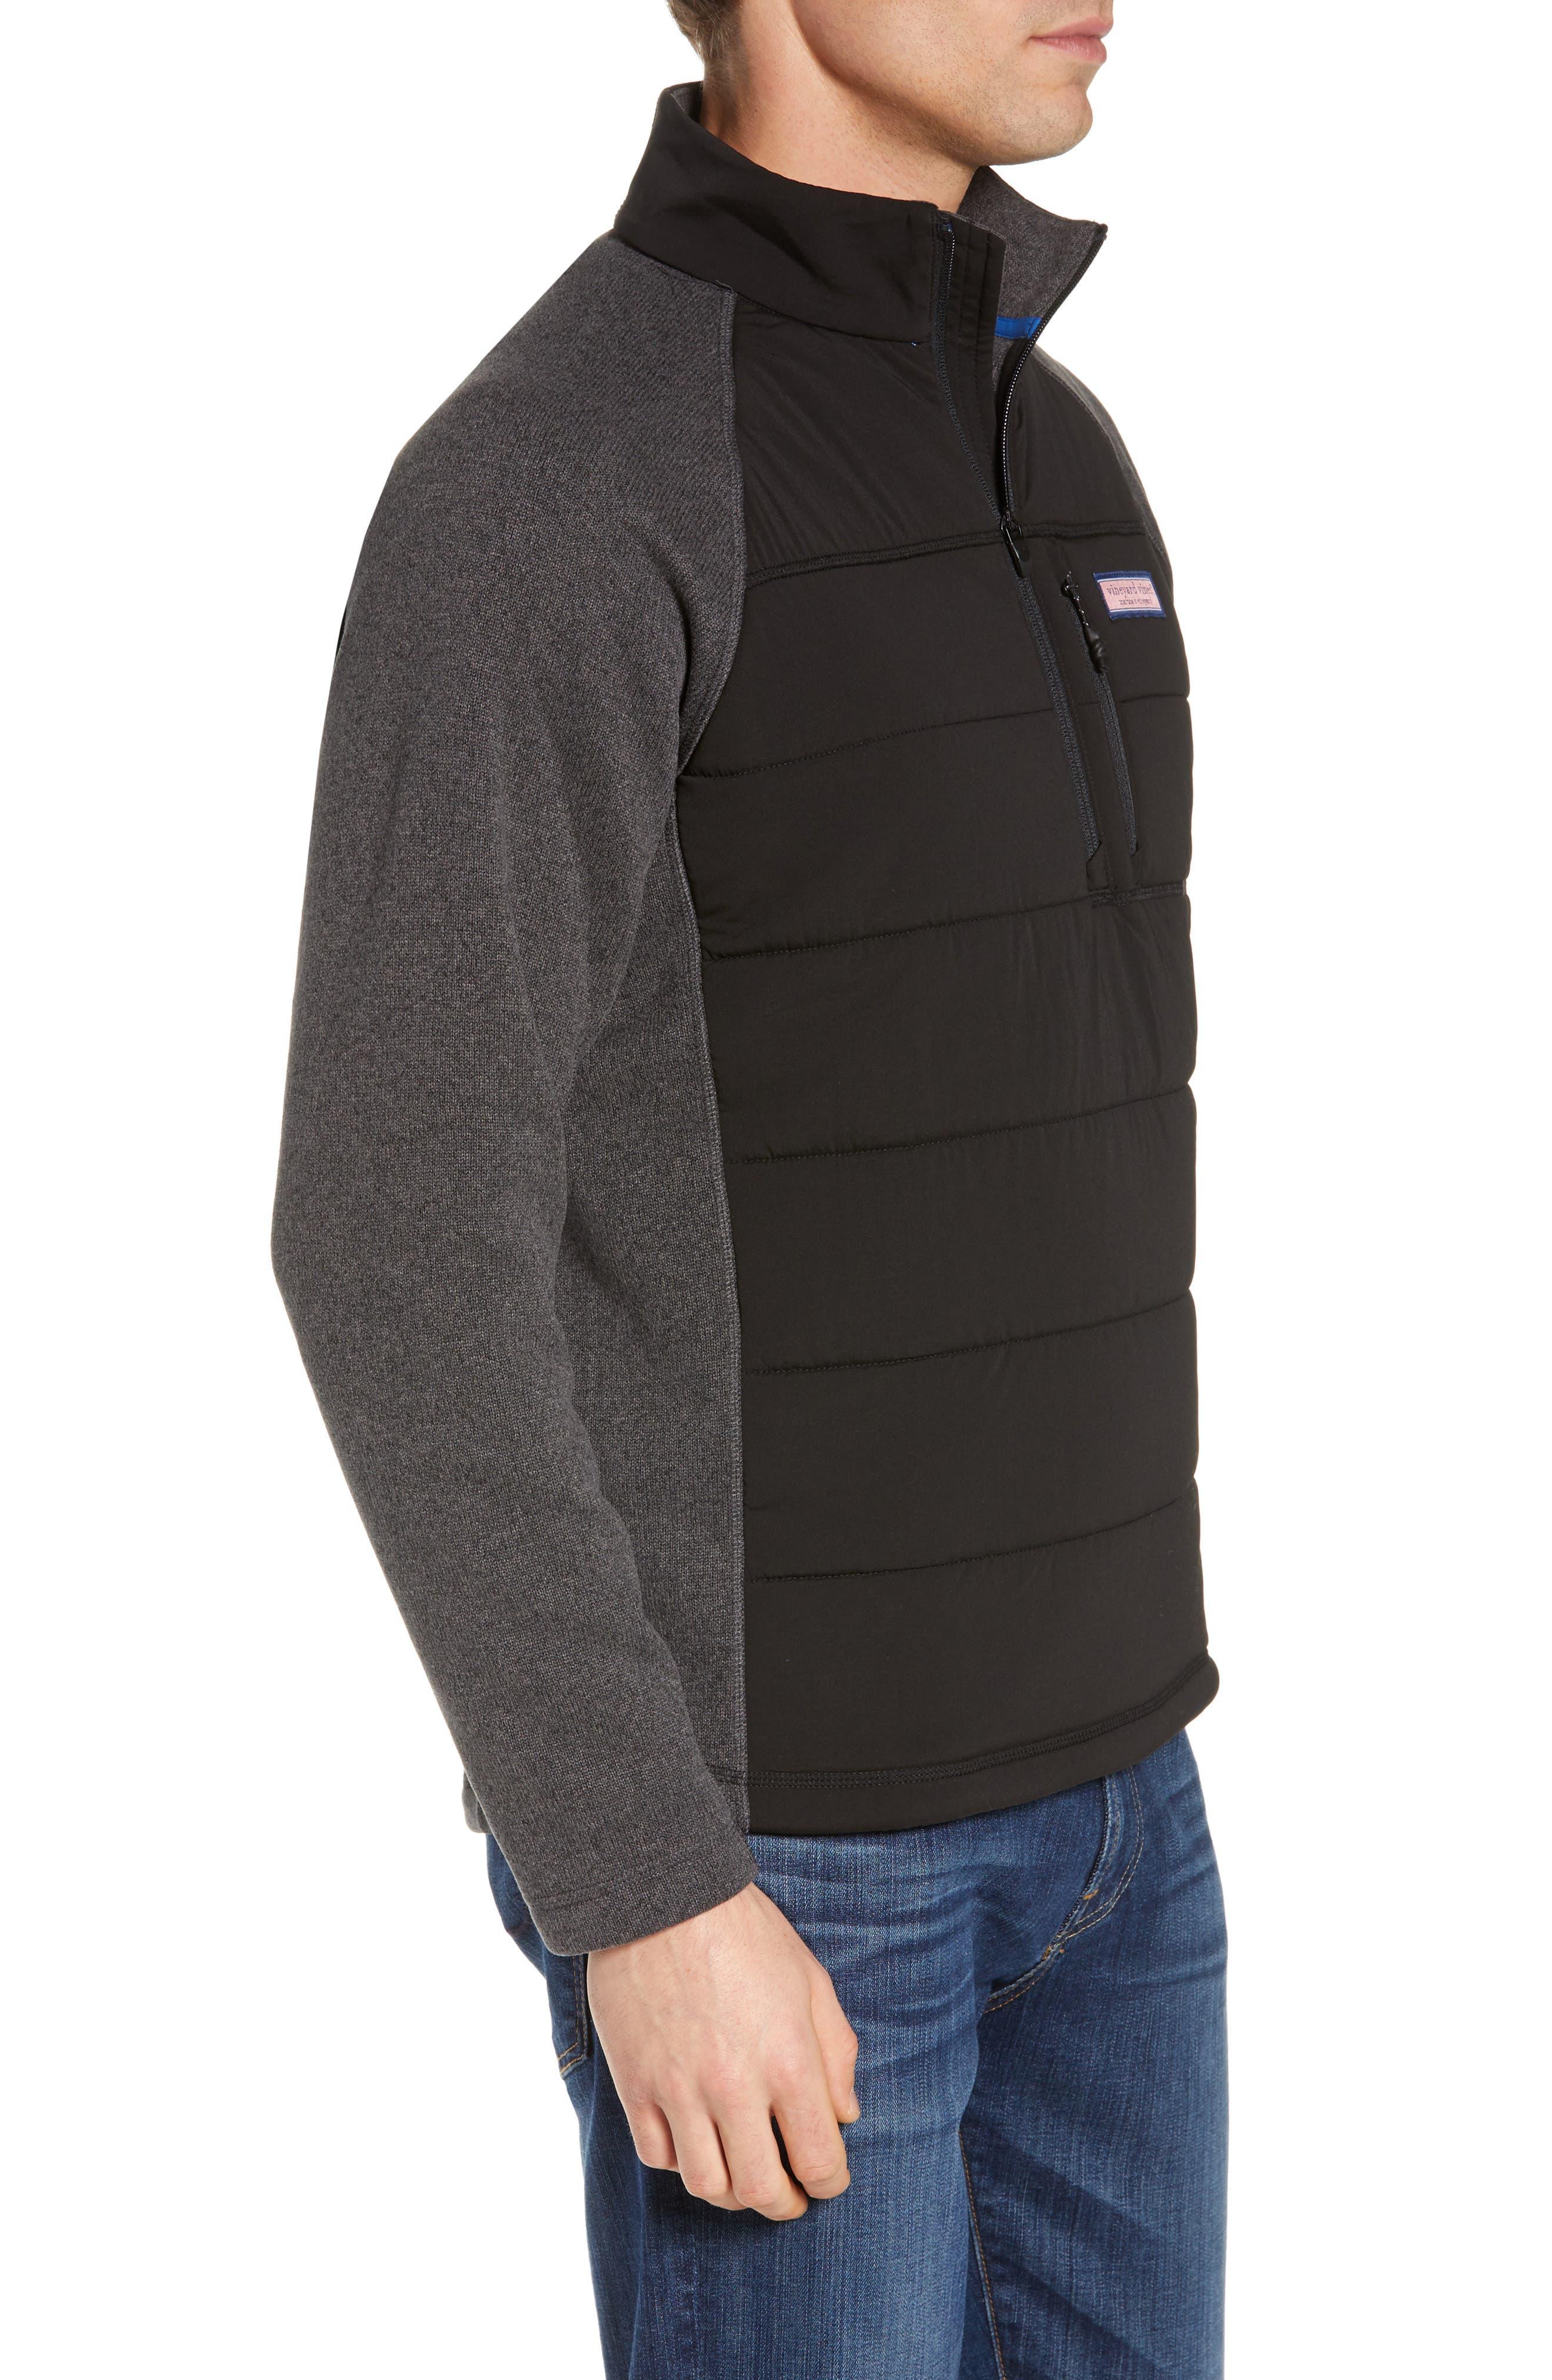 Seaward Fleece Half Zip Pullover,                             Alternate thumbnail 3, color,                             NOCTURNE